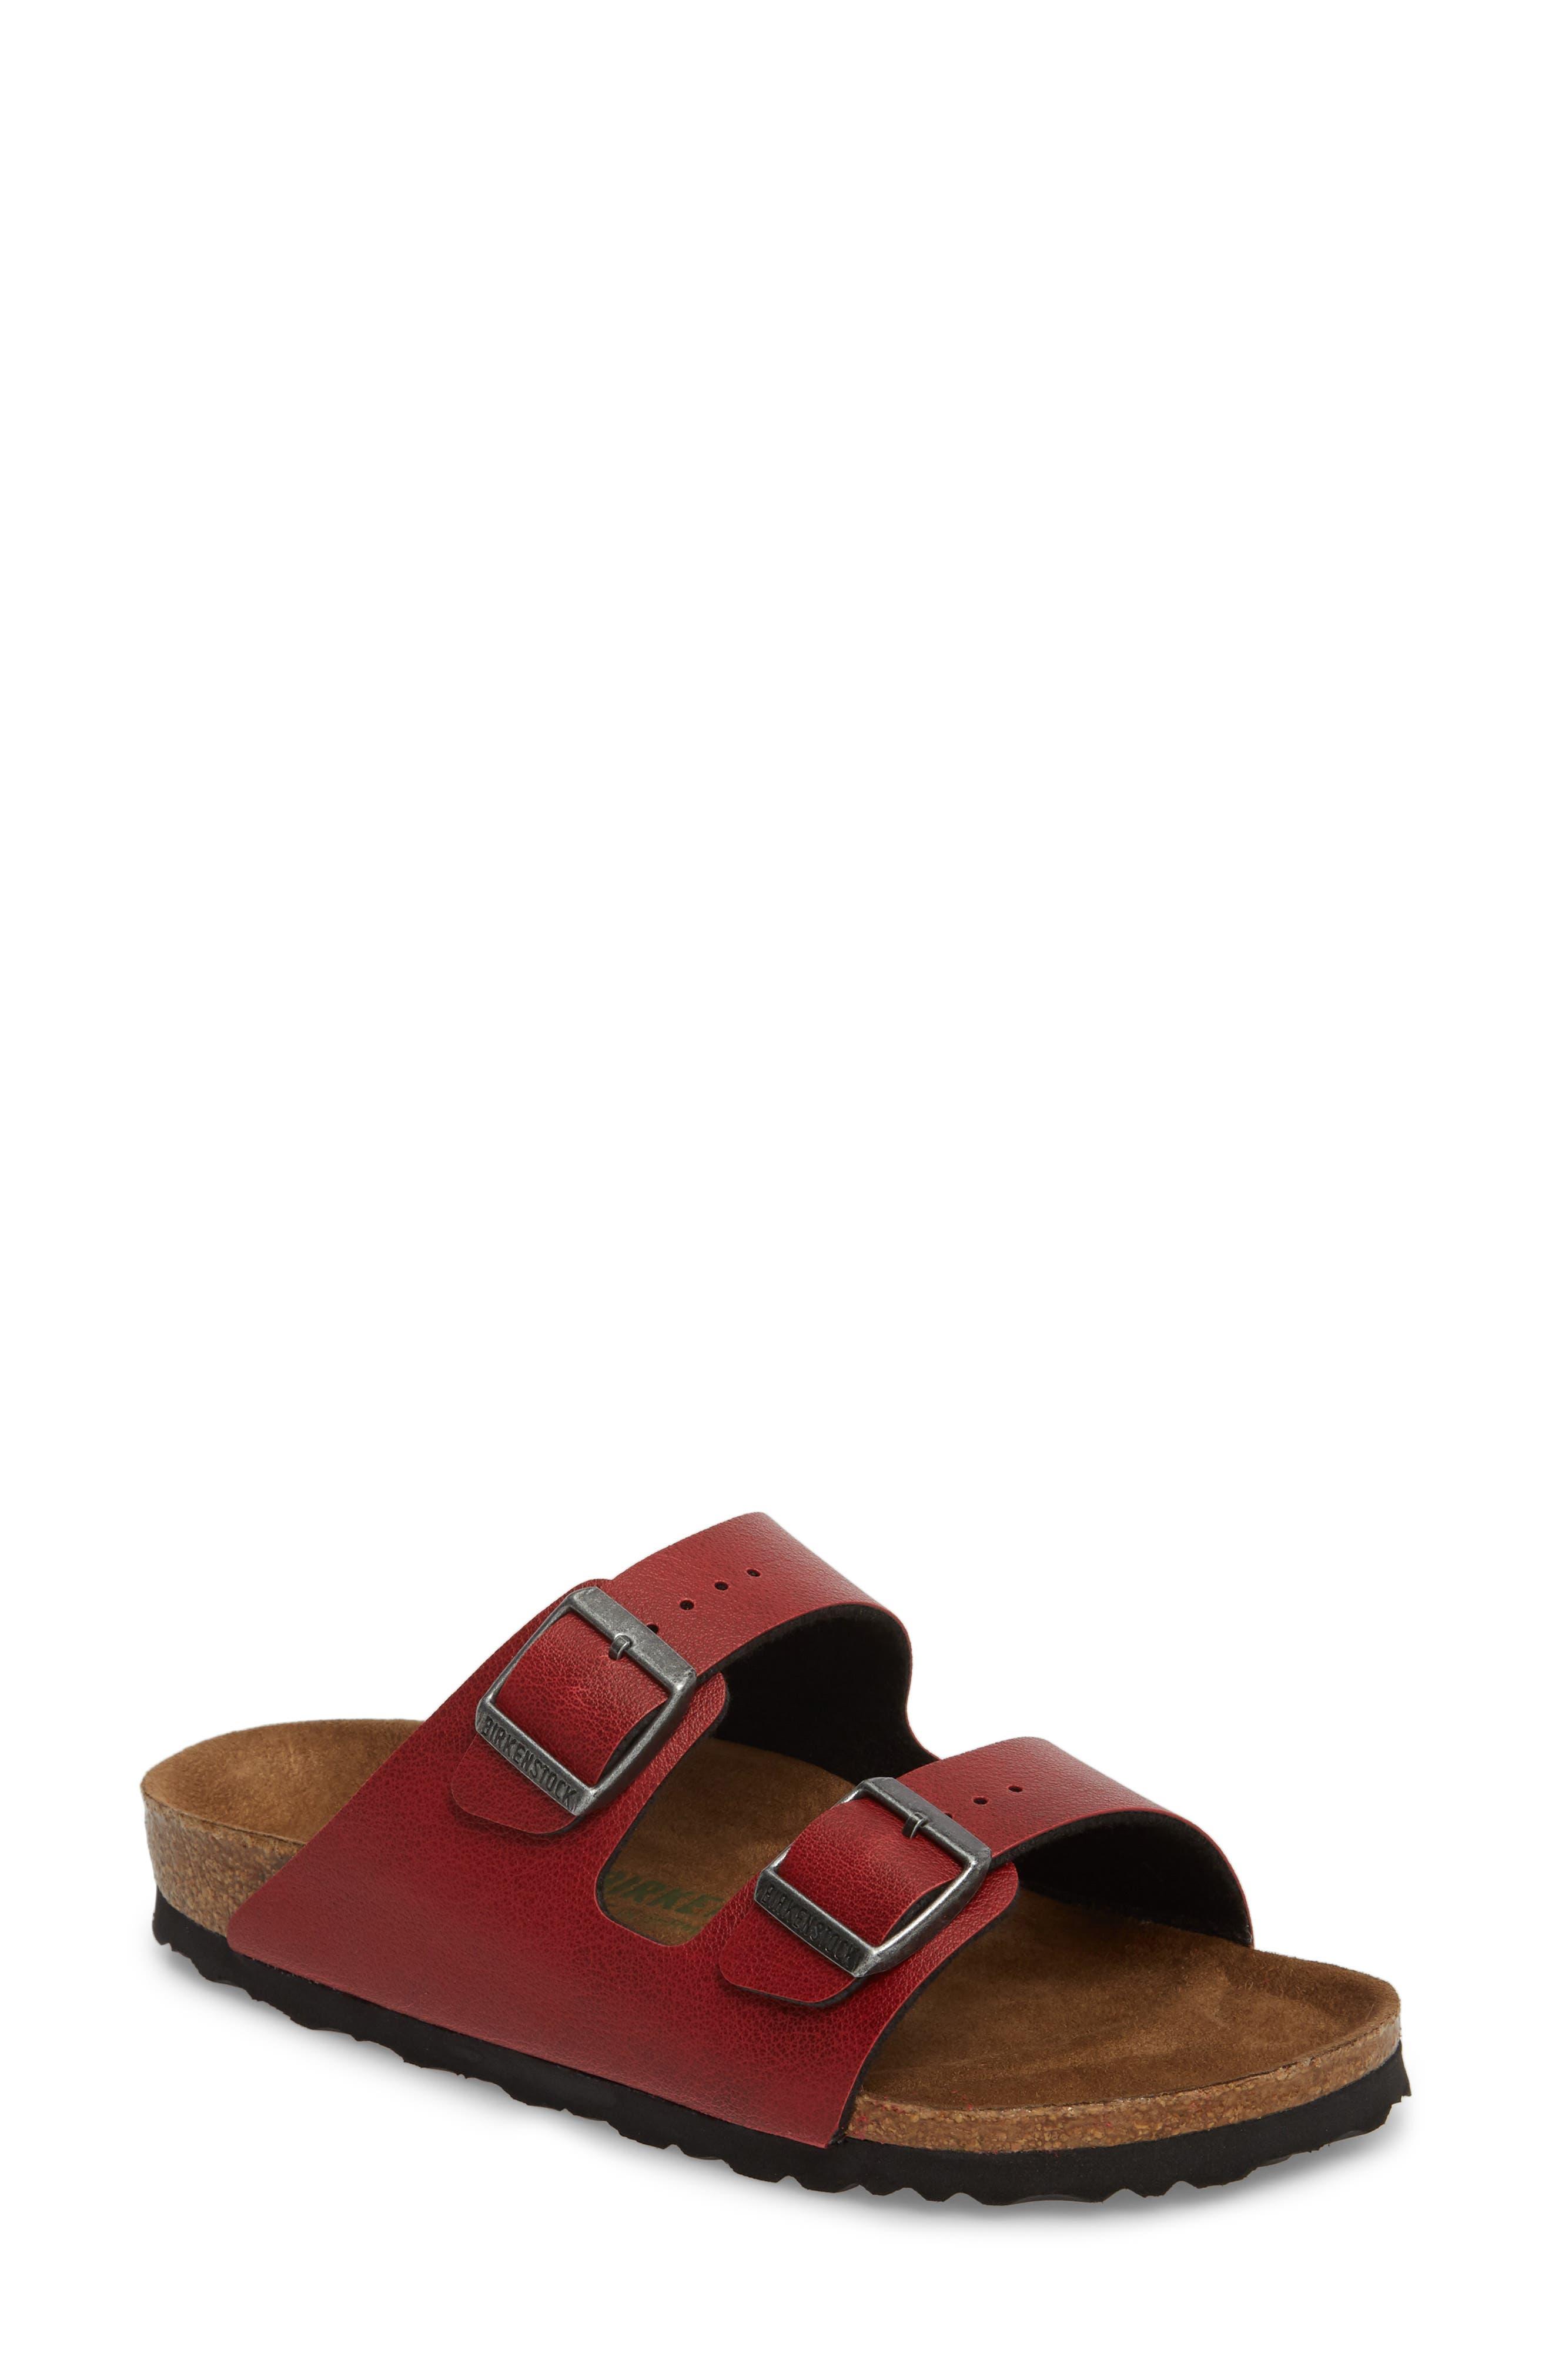 Birkenstock Arizona Birko-Flor(TM) Slide Sandal